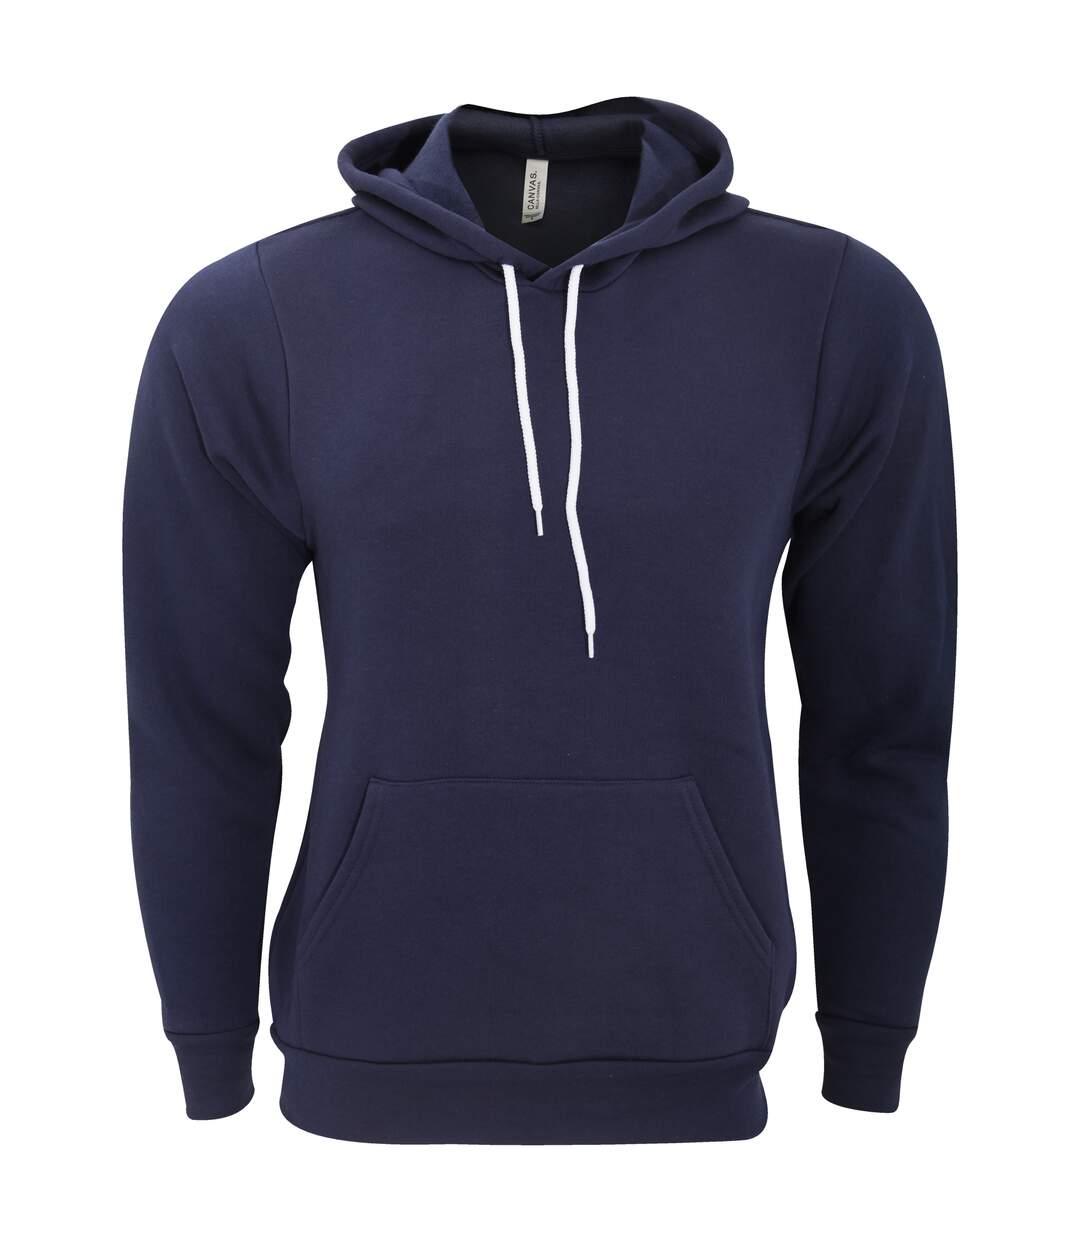 Bella + Canvas Unisex Pullover Polycotton Fleece Hooded Sweatshirt / Hoodie (Navy Blue) - UTBC1336